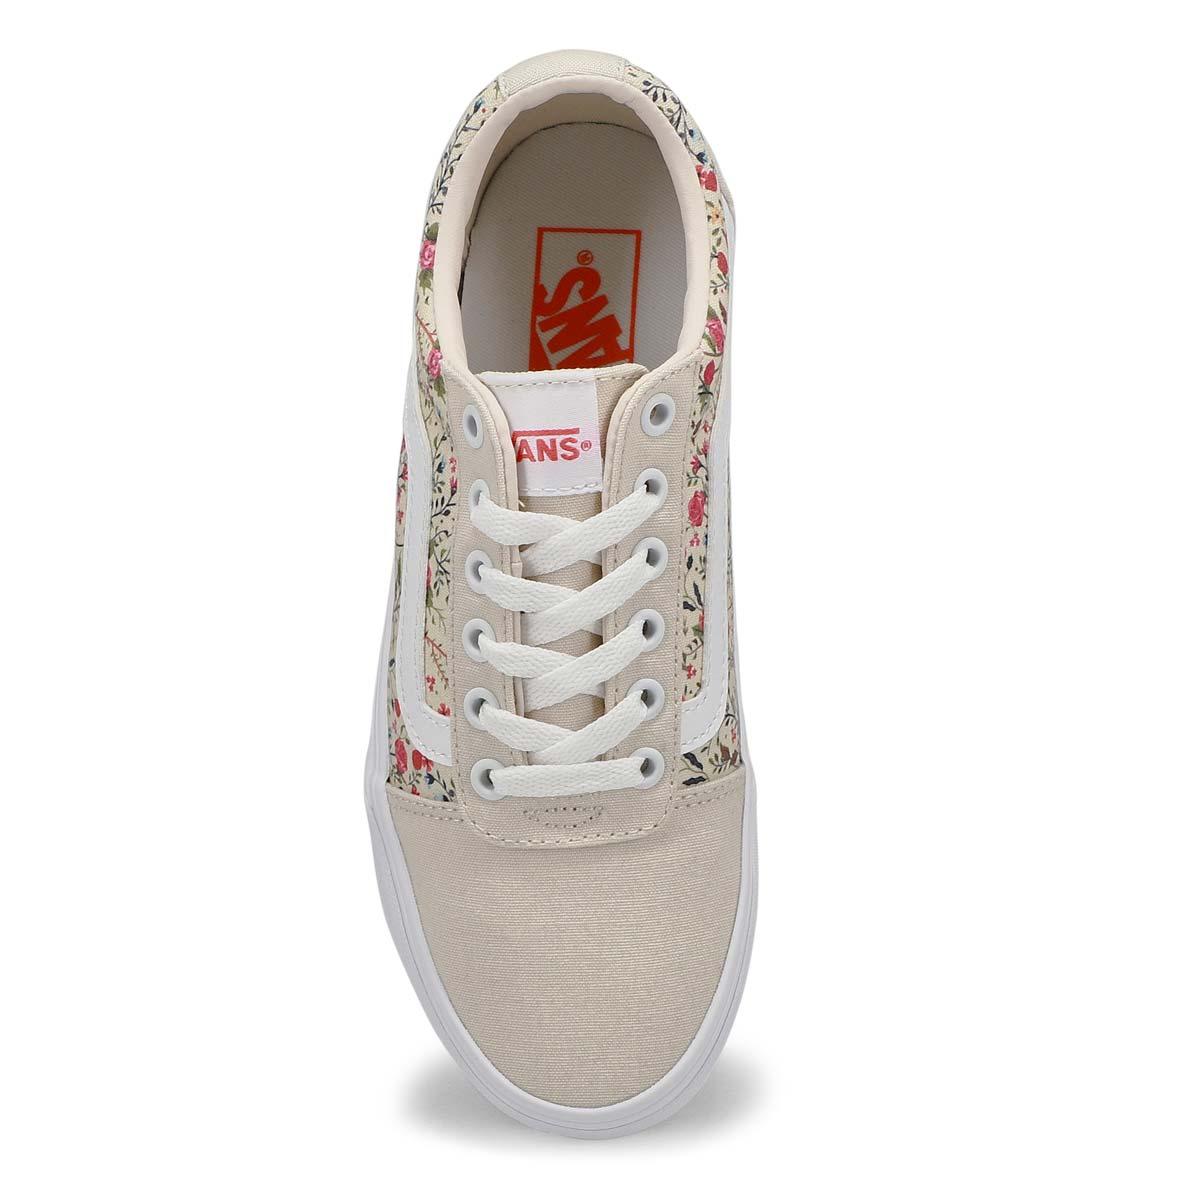 Women's Ward Sneaker - Turtle Dove Floral/White